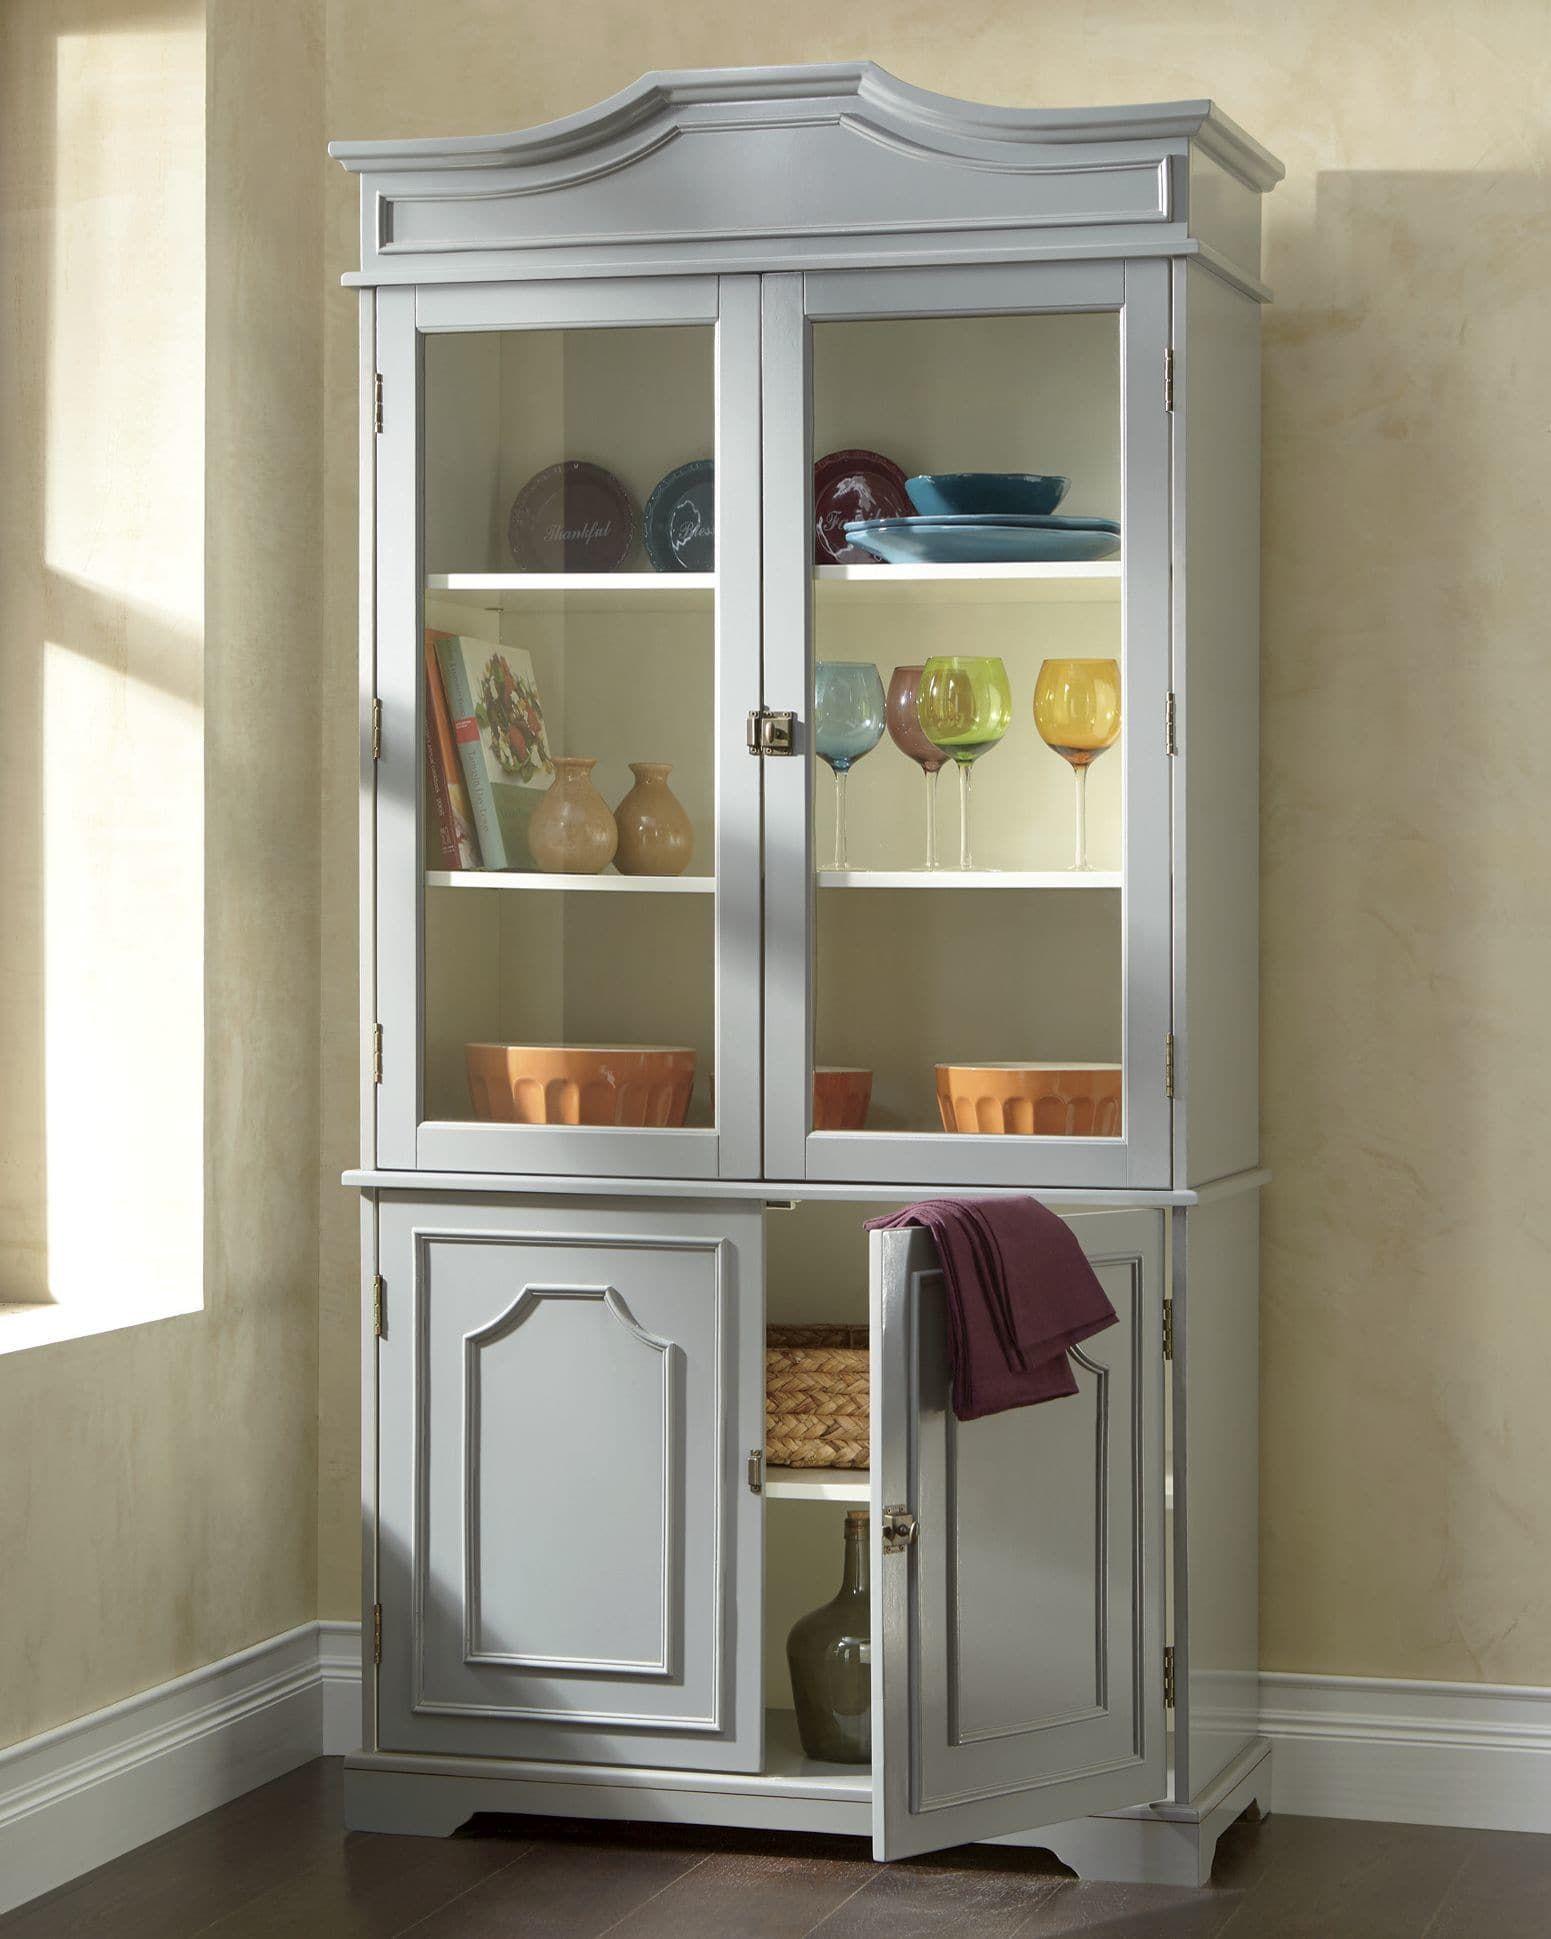 Admirable Chadwick Gray Hutch From Montgomery Ward S9741195 Interior Design Ideas Skatsoteloinfo